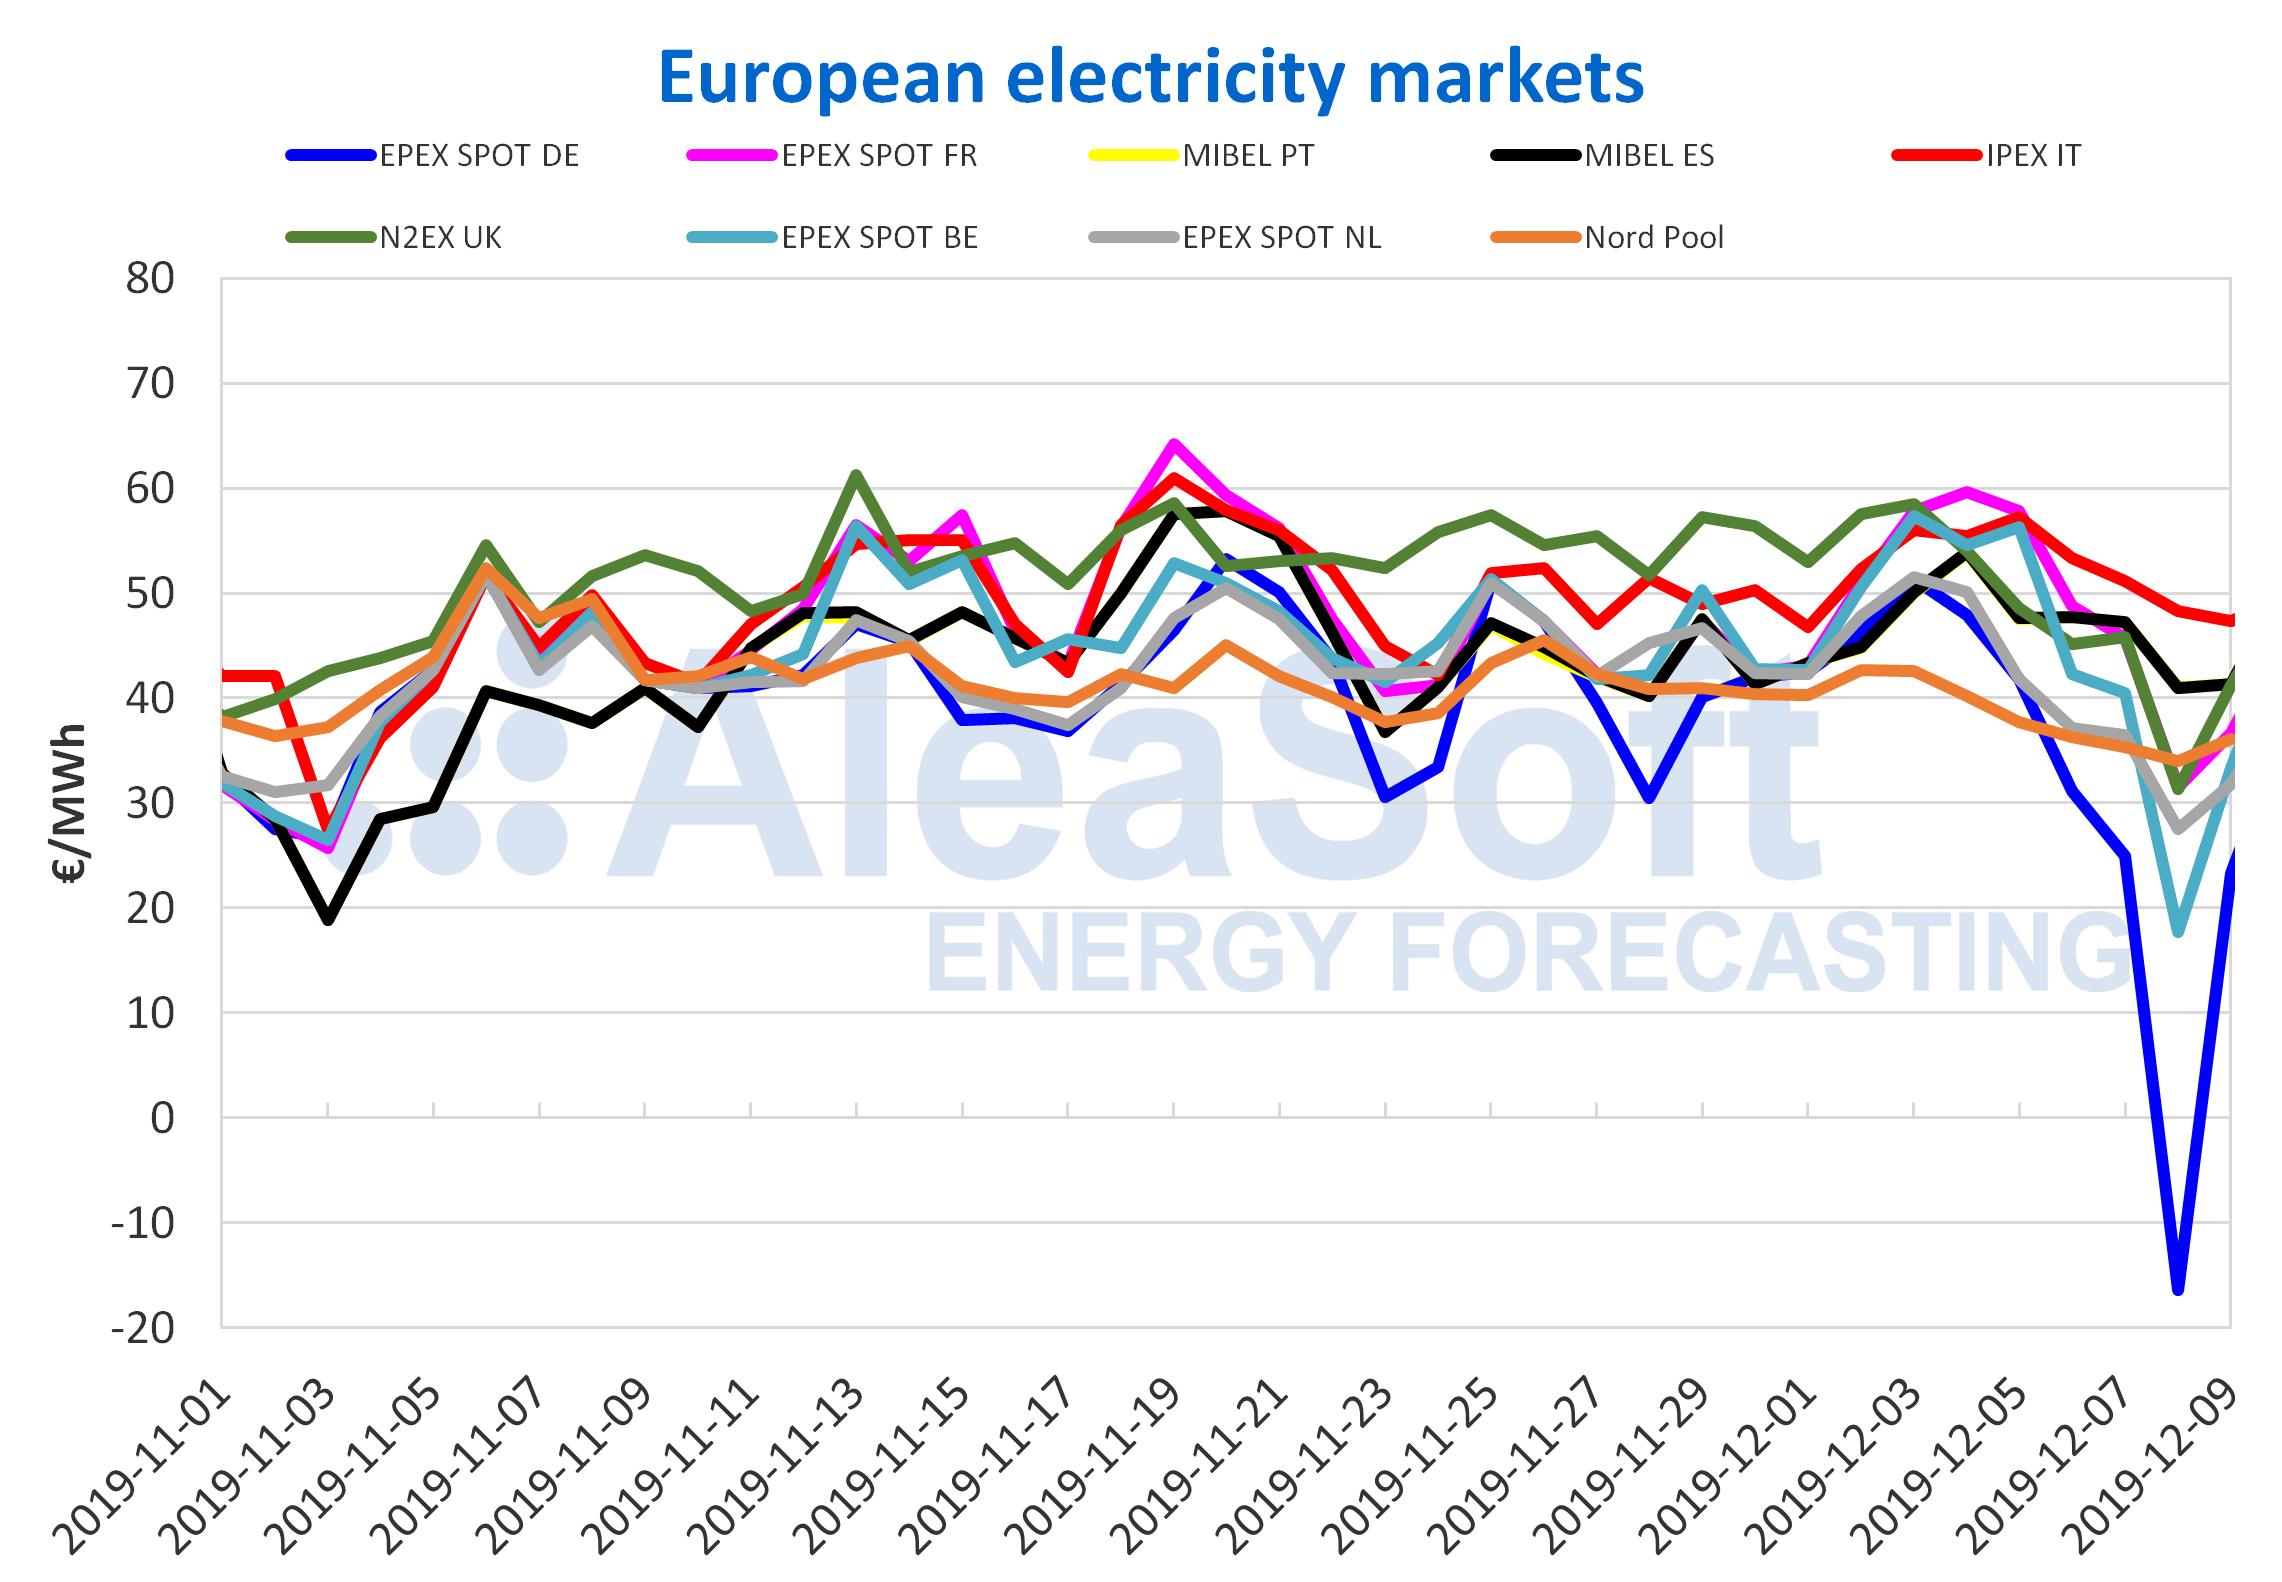 AleaSoft - European electricity markets